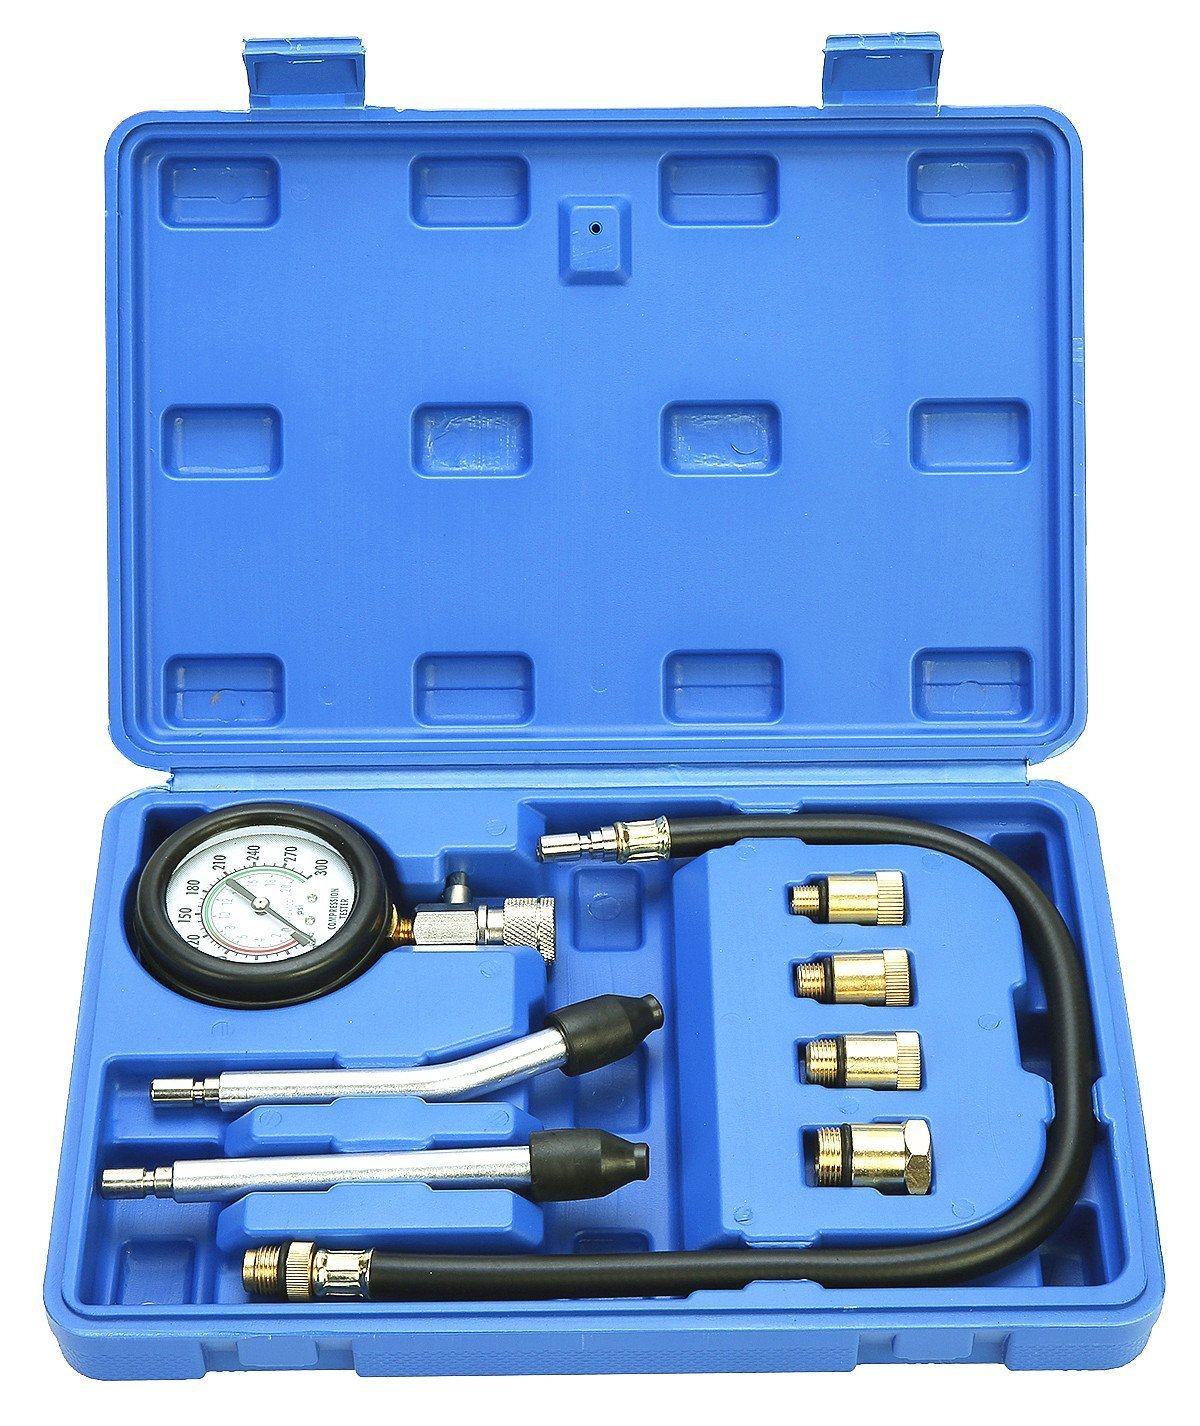 FreeTec–outdoor-special Cuchilla kompressionstester Detector prueba dispositivo Motor de gasolina 0–20bar o 0–300psi, cuchillo Moreno freebirdtrading